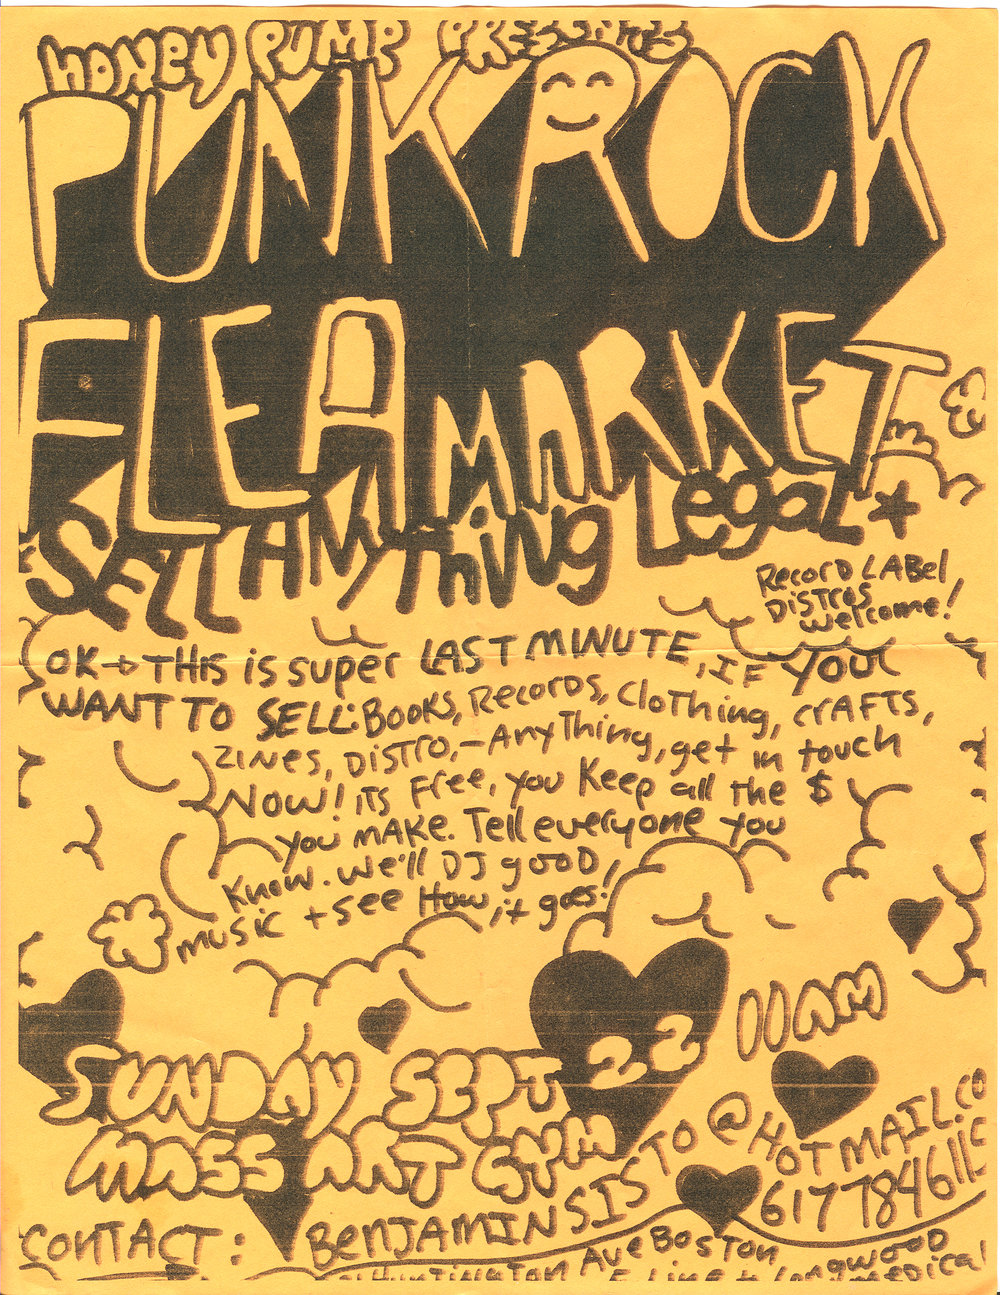 09.22.03-BOSTON-MASSART-PRFM.jpg